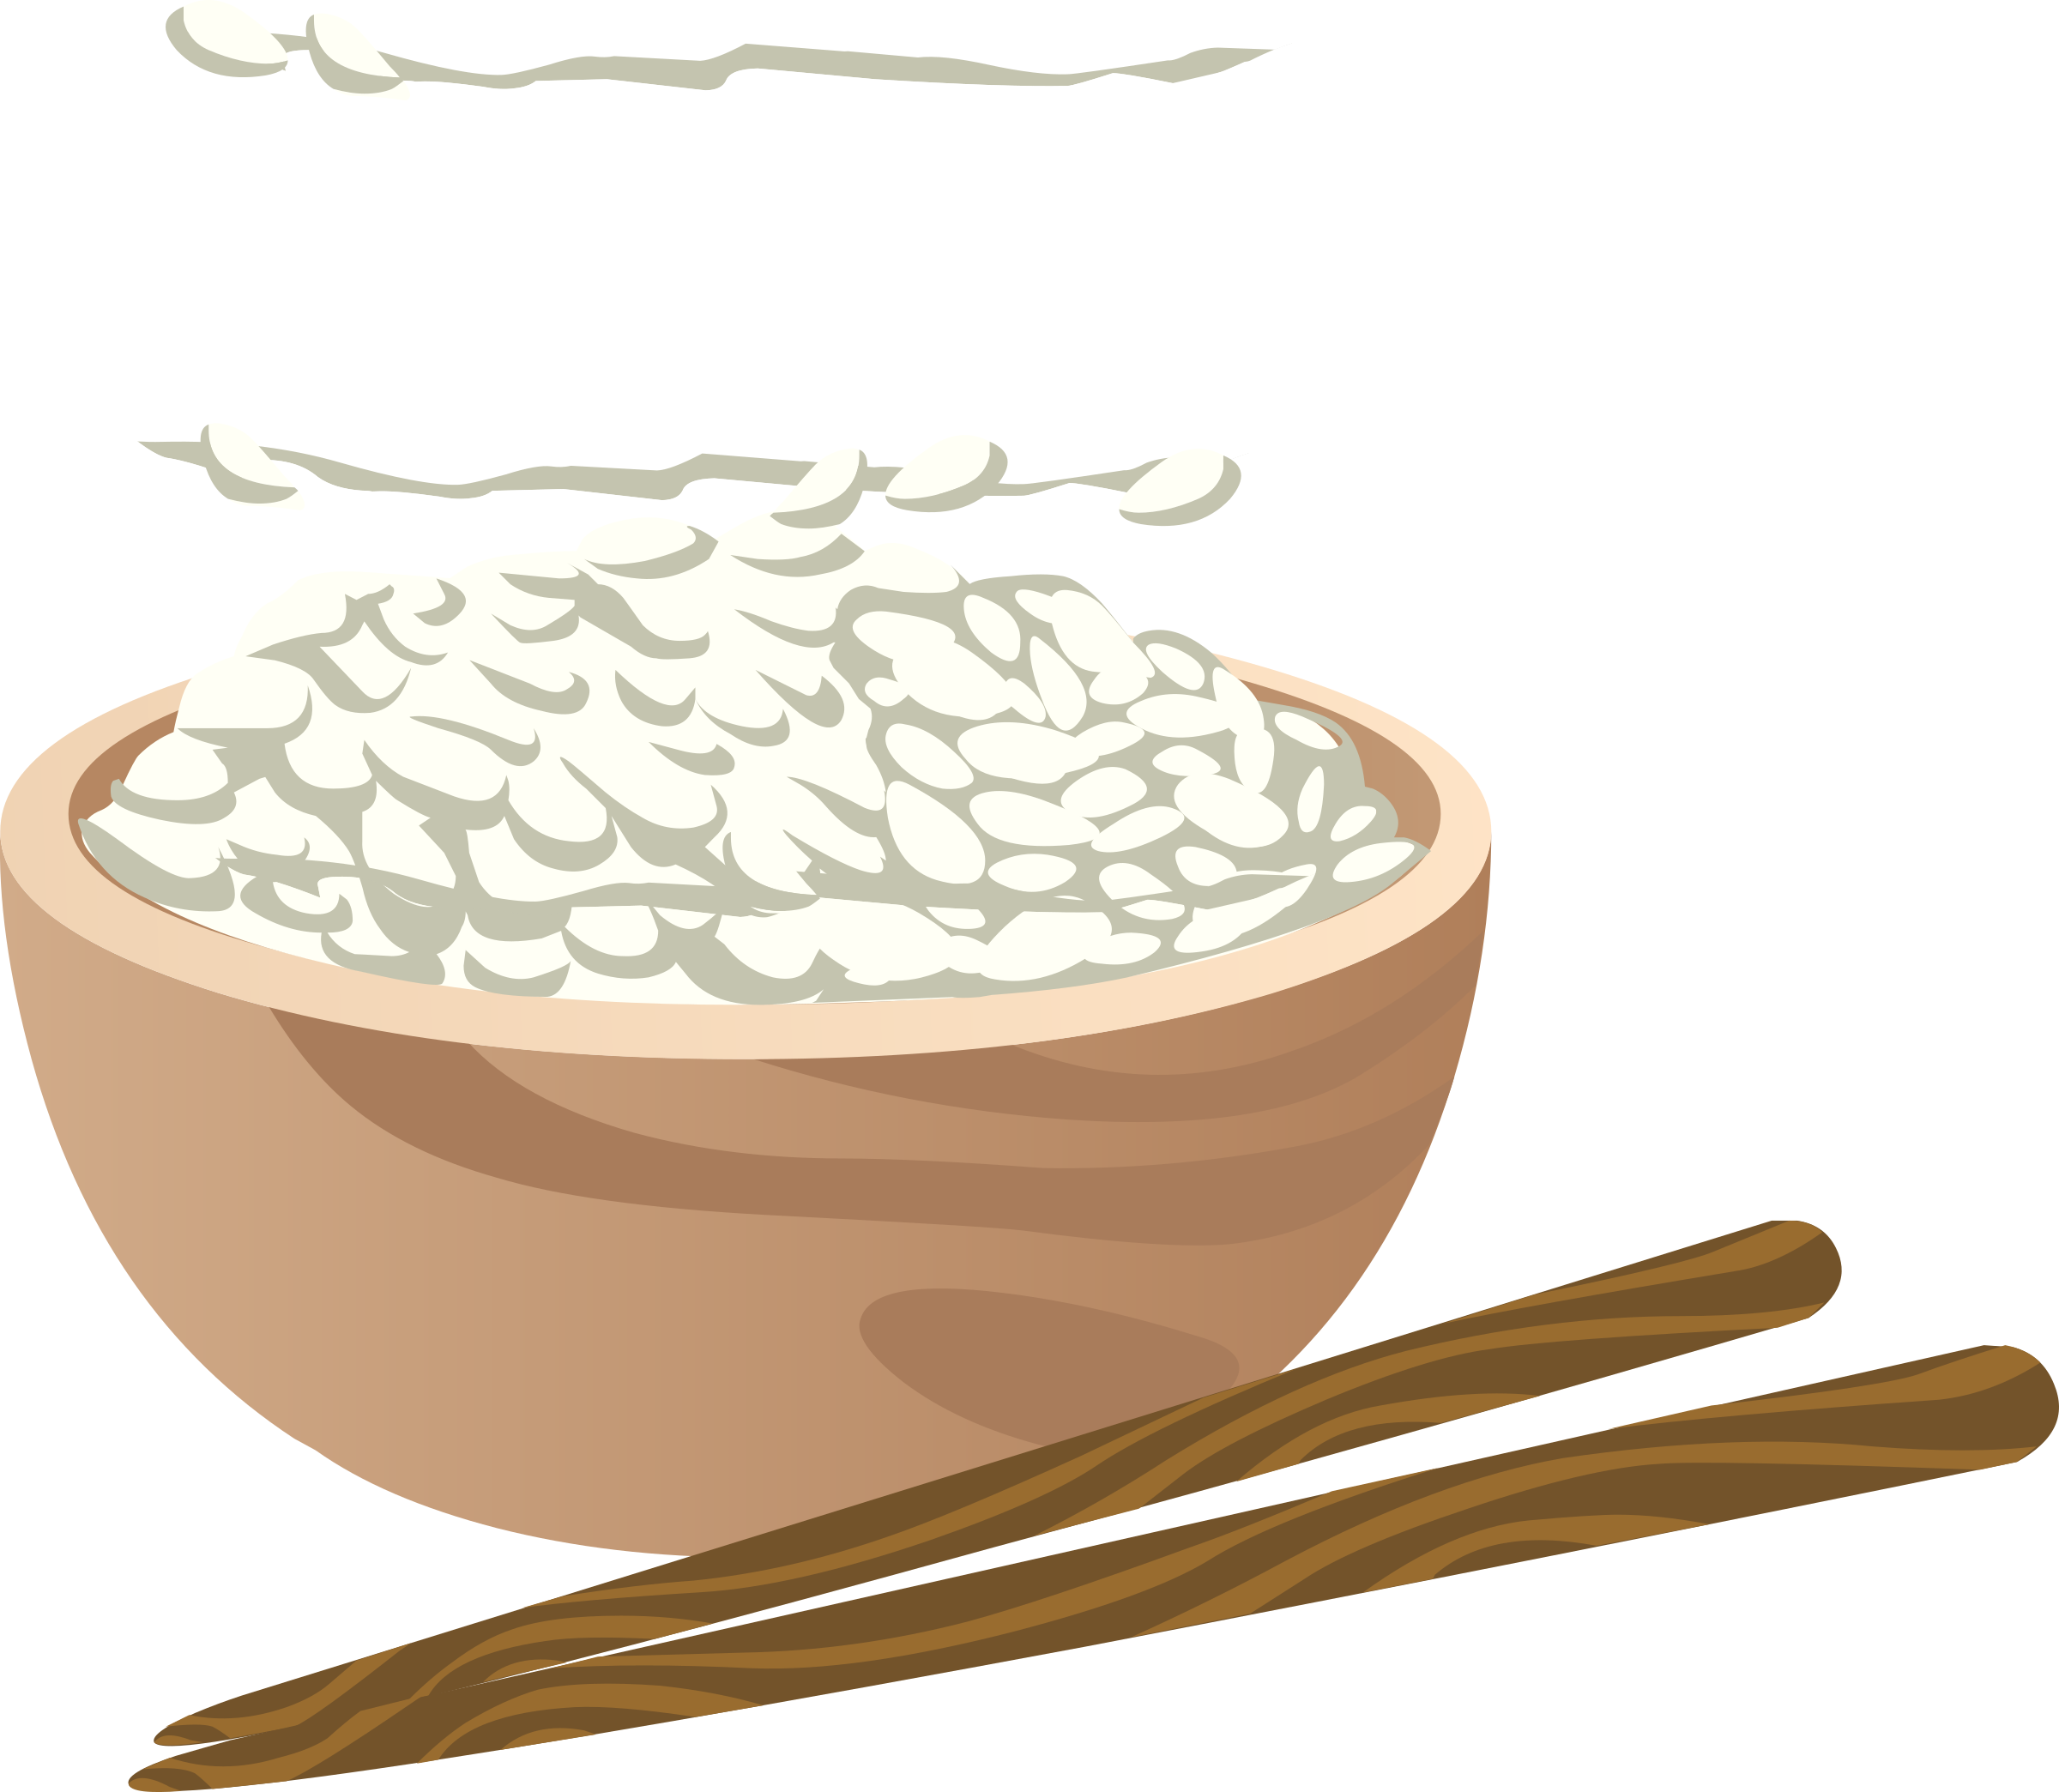 Rice clipart rice leaf. Food proper big image